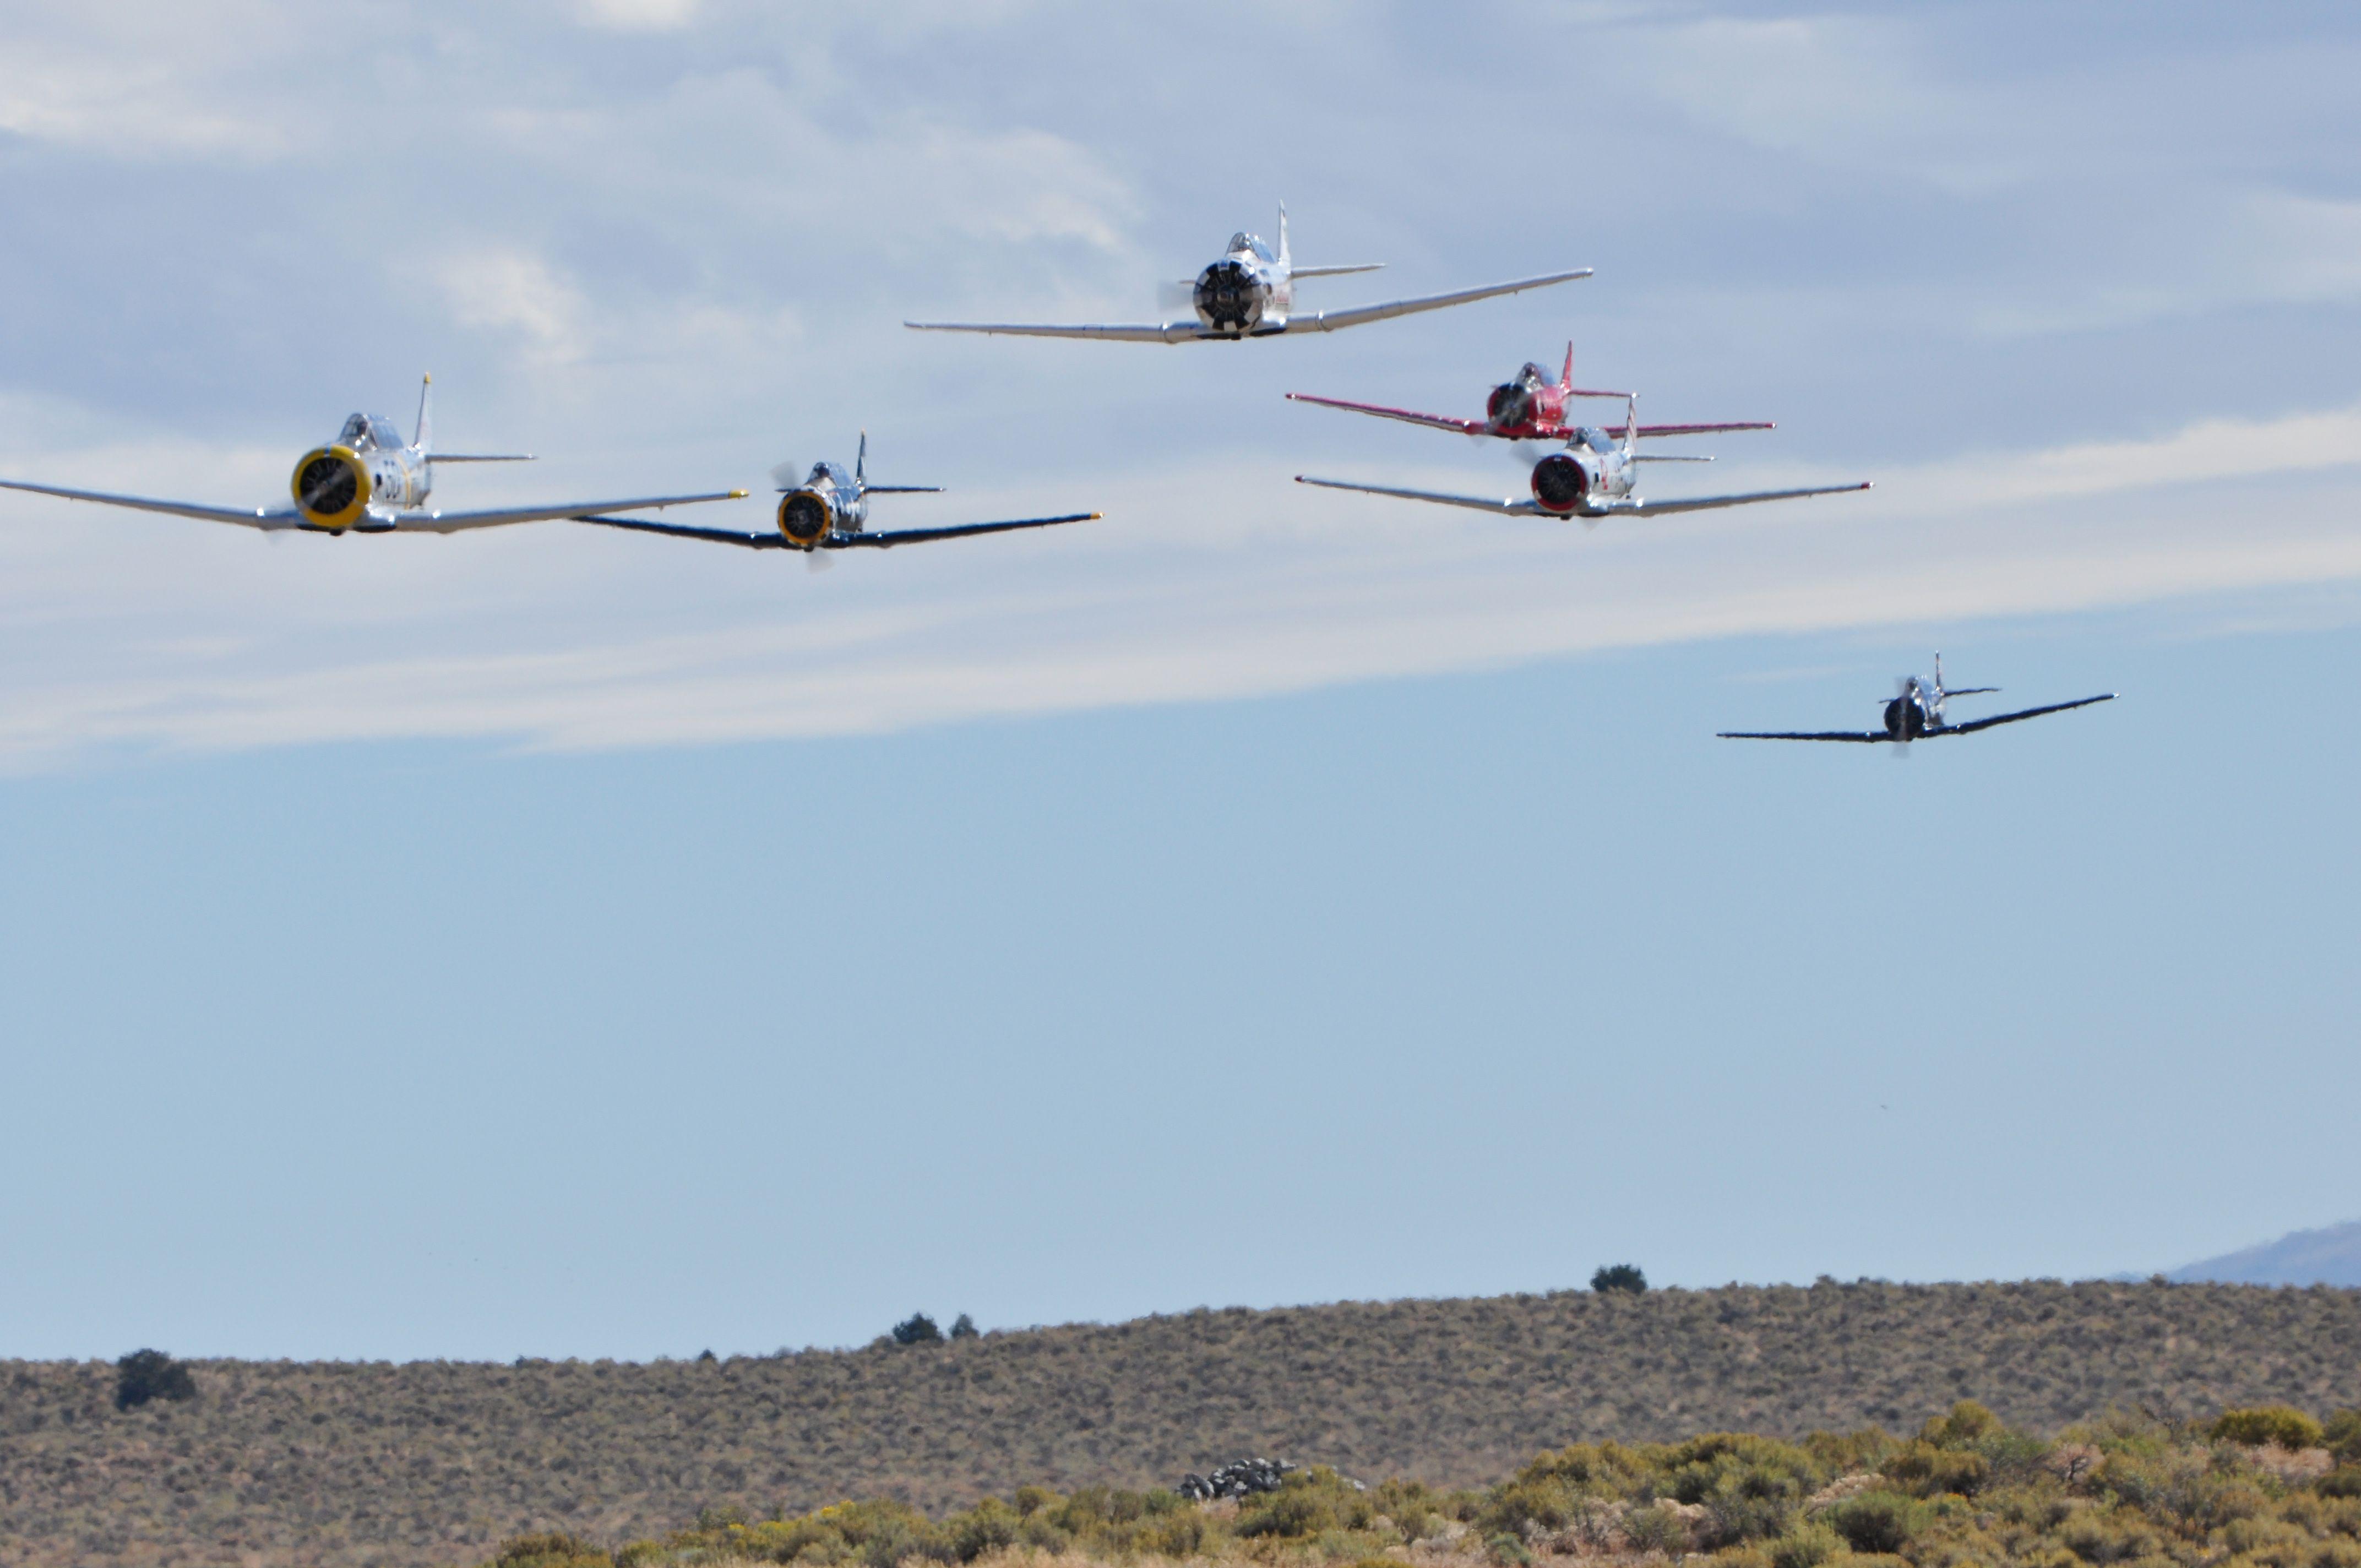 Reno Air races Archives - Waco • Pitts • J3 Cub Rides | Air